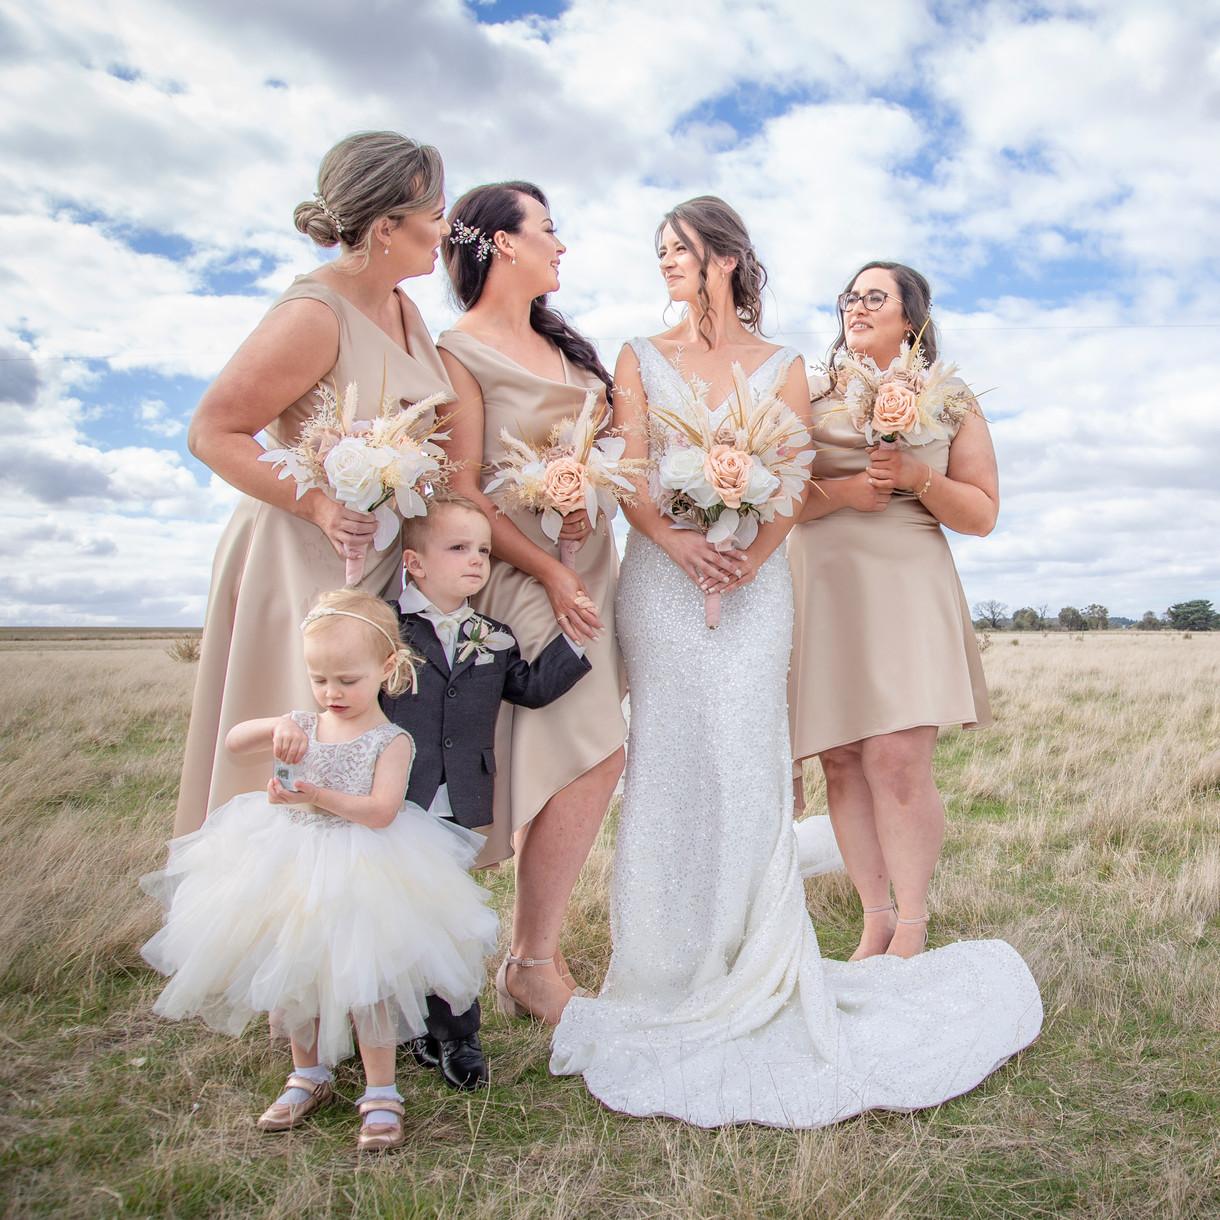 Wedding Photographer Ballarat-15.jpg